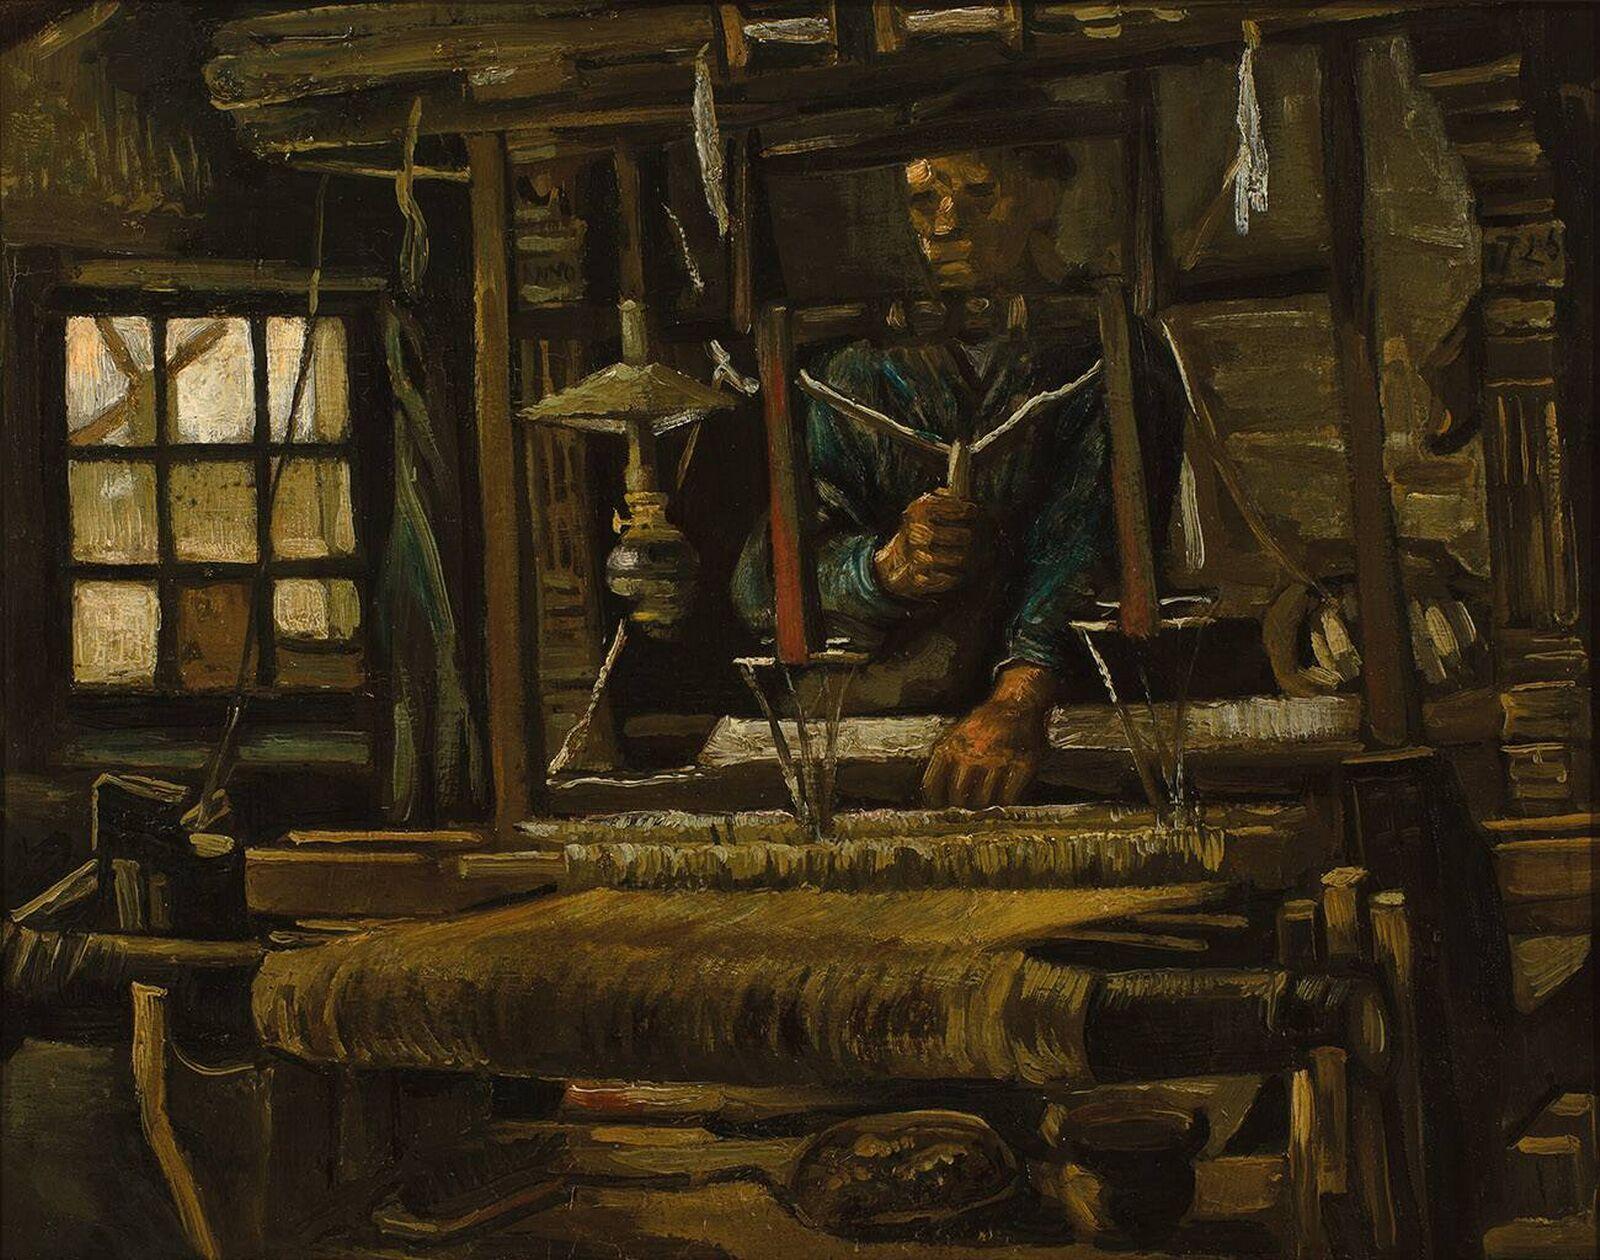 https://i0.wp.com/upload.wikimedia.org/wikipedia/commons/f/fe/Vincent_van_Gogh_0141.jpg